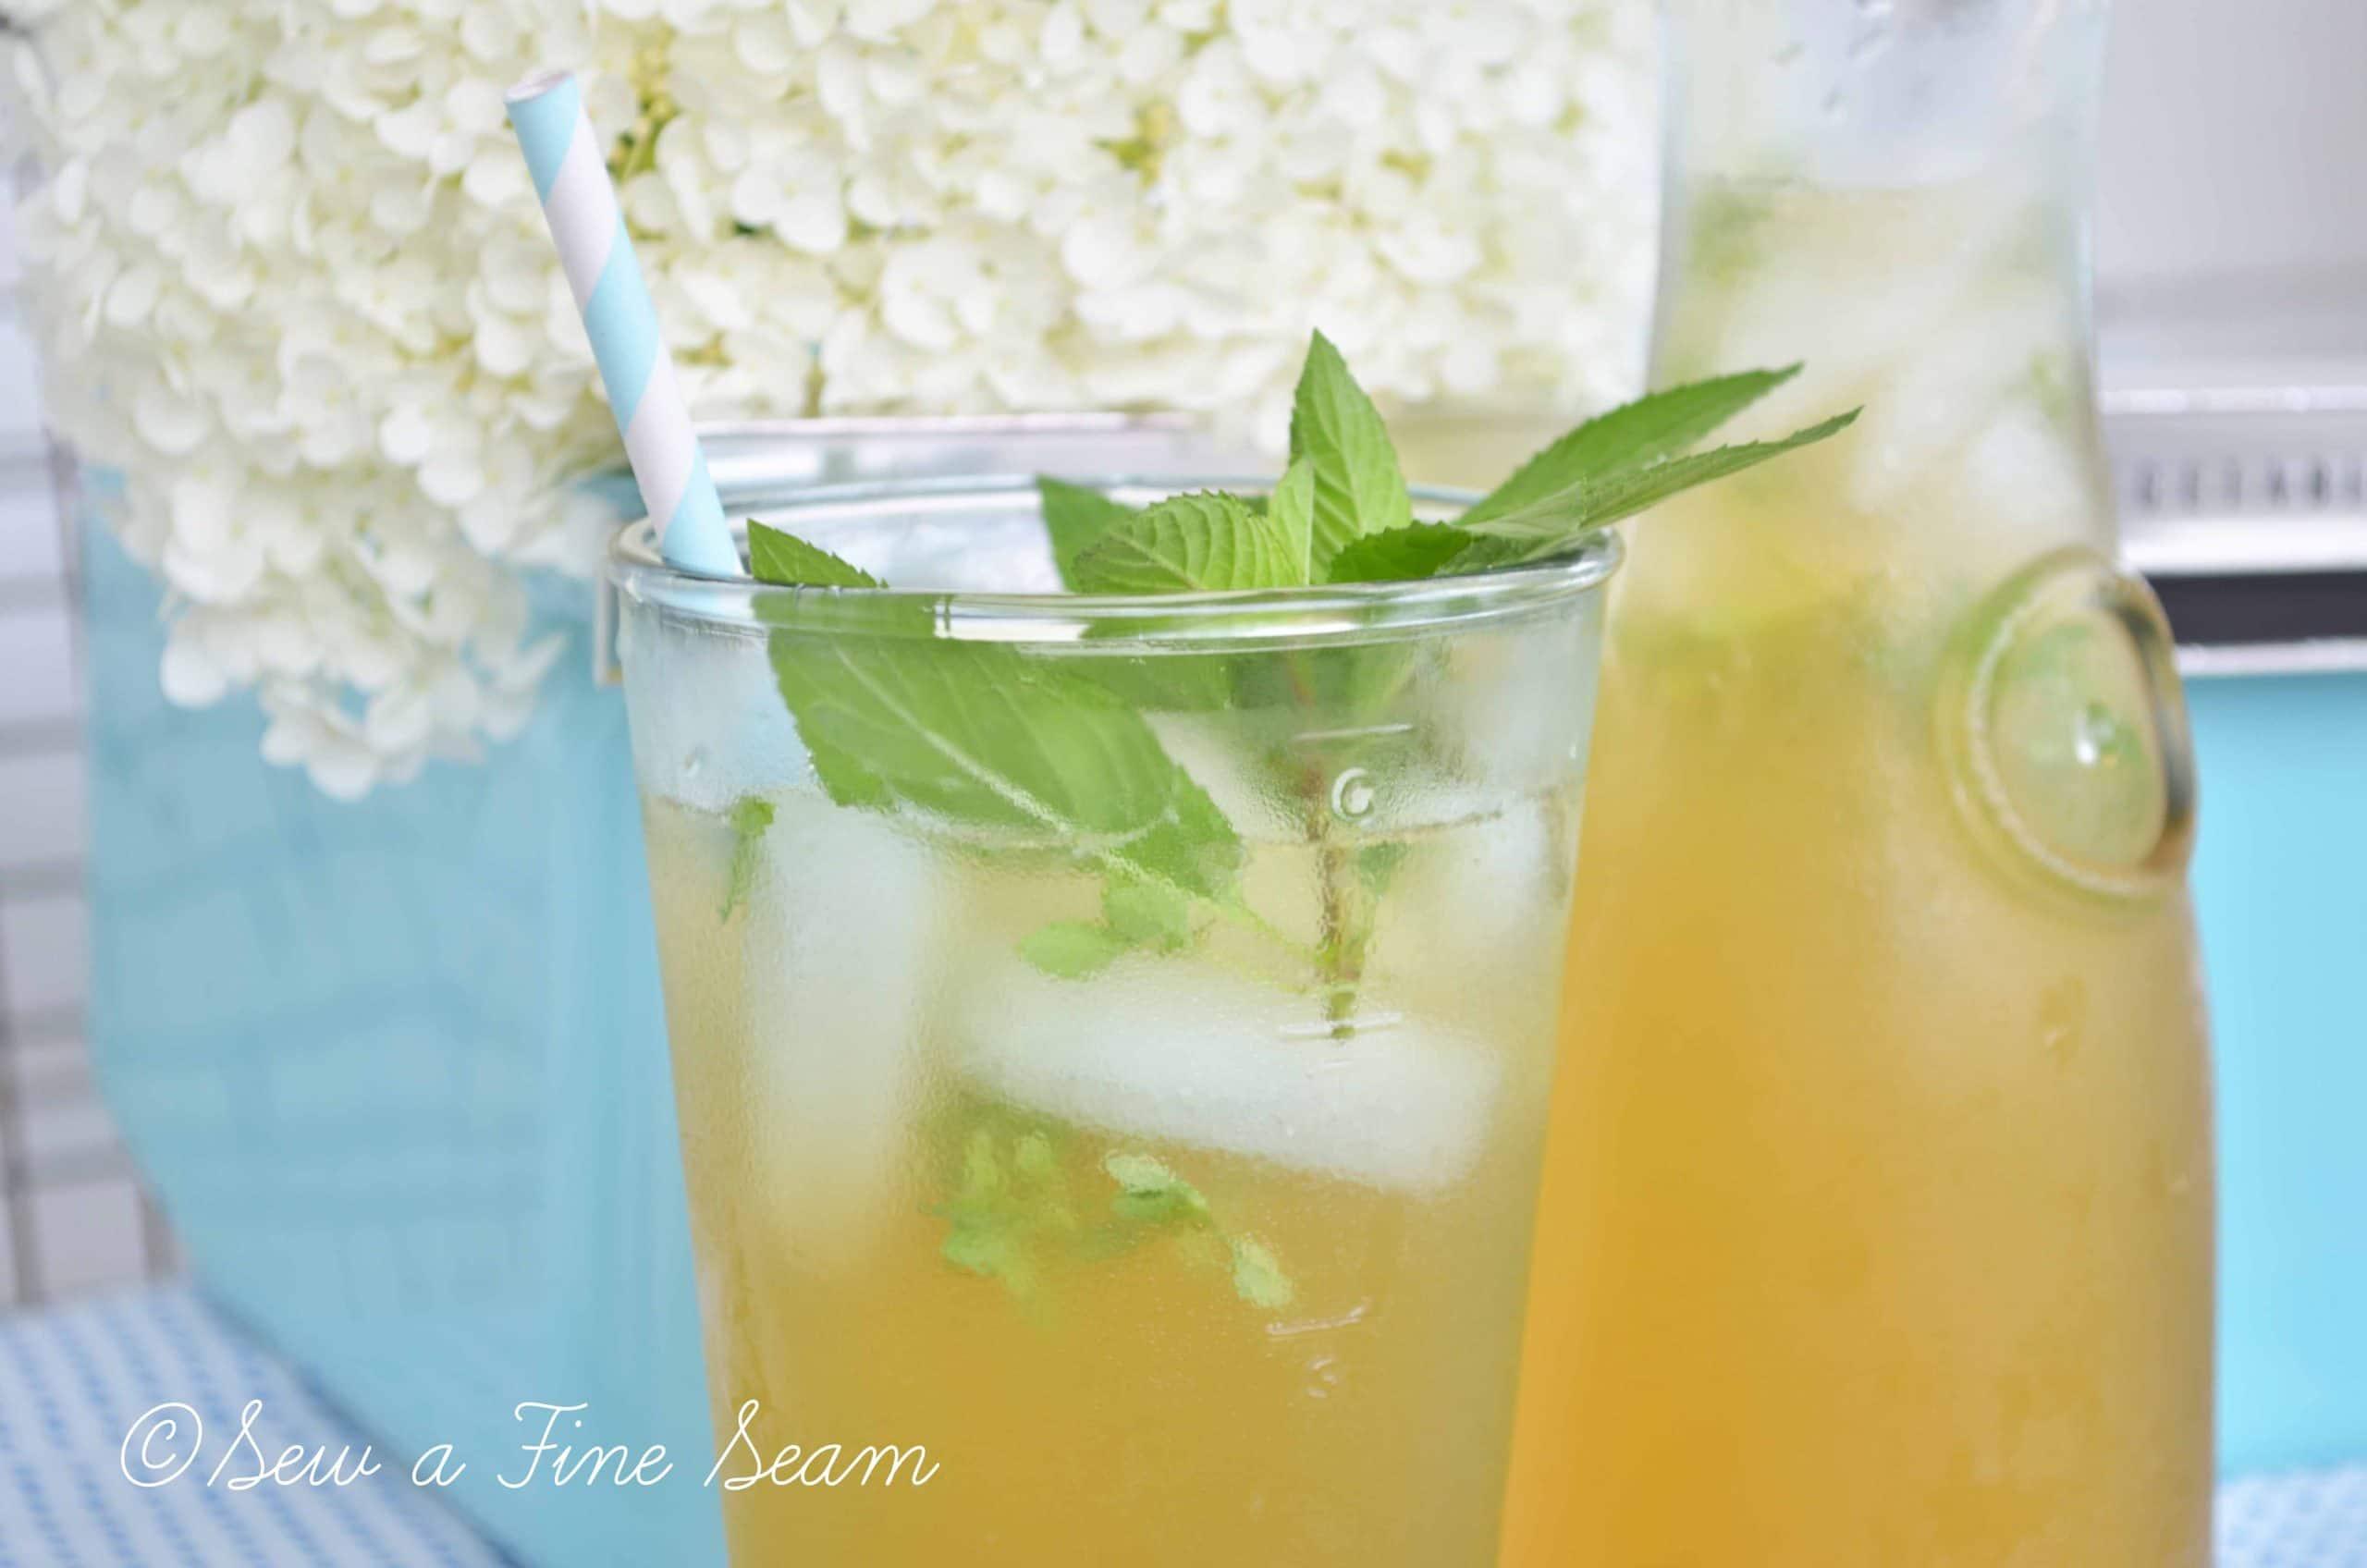 Sweet Tea with Lemonade and Basil